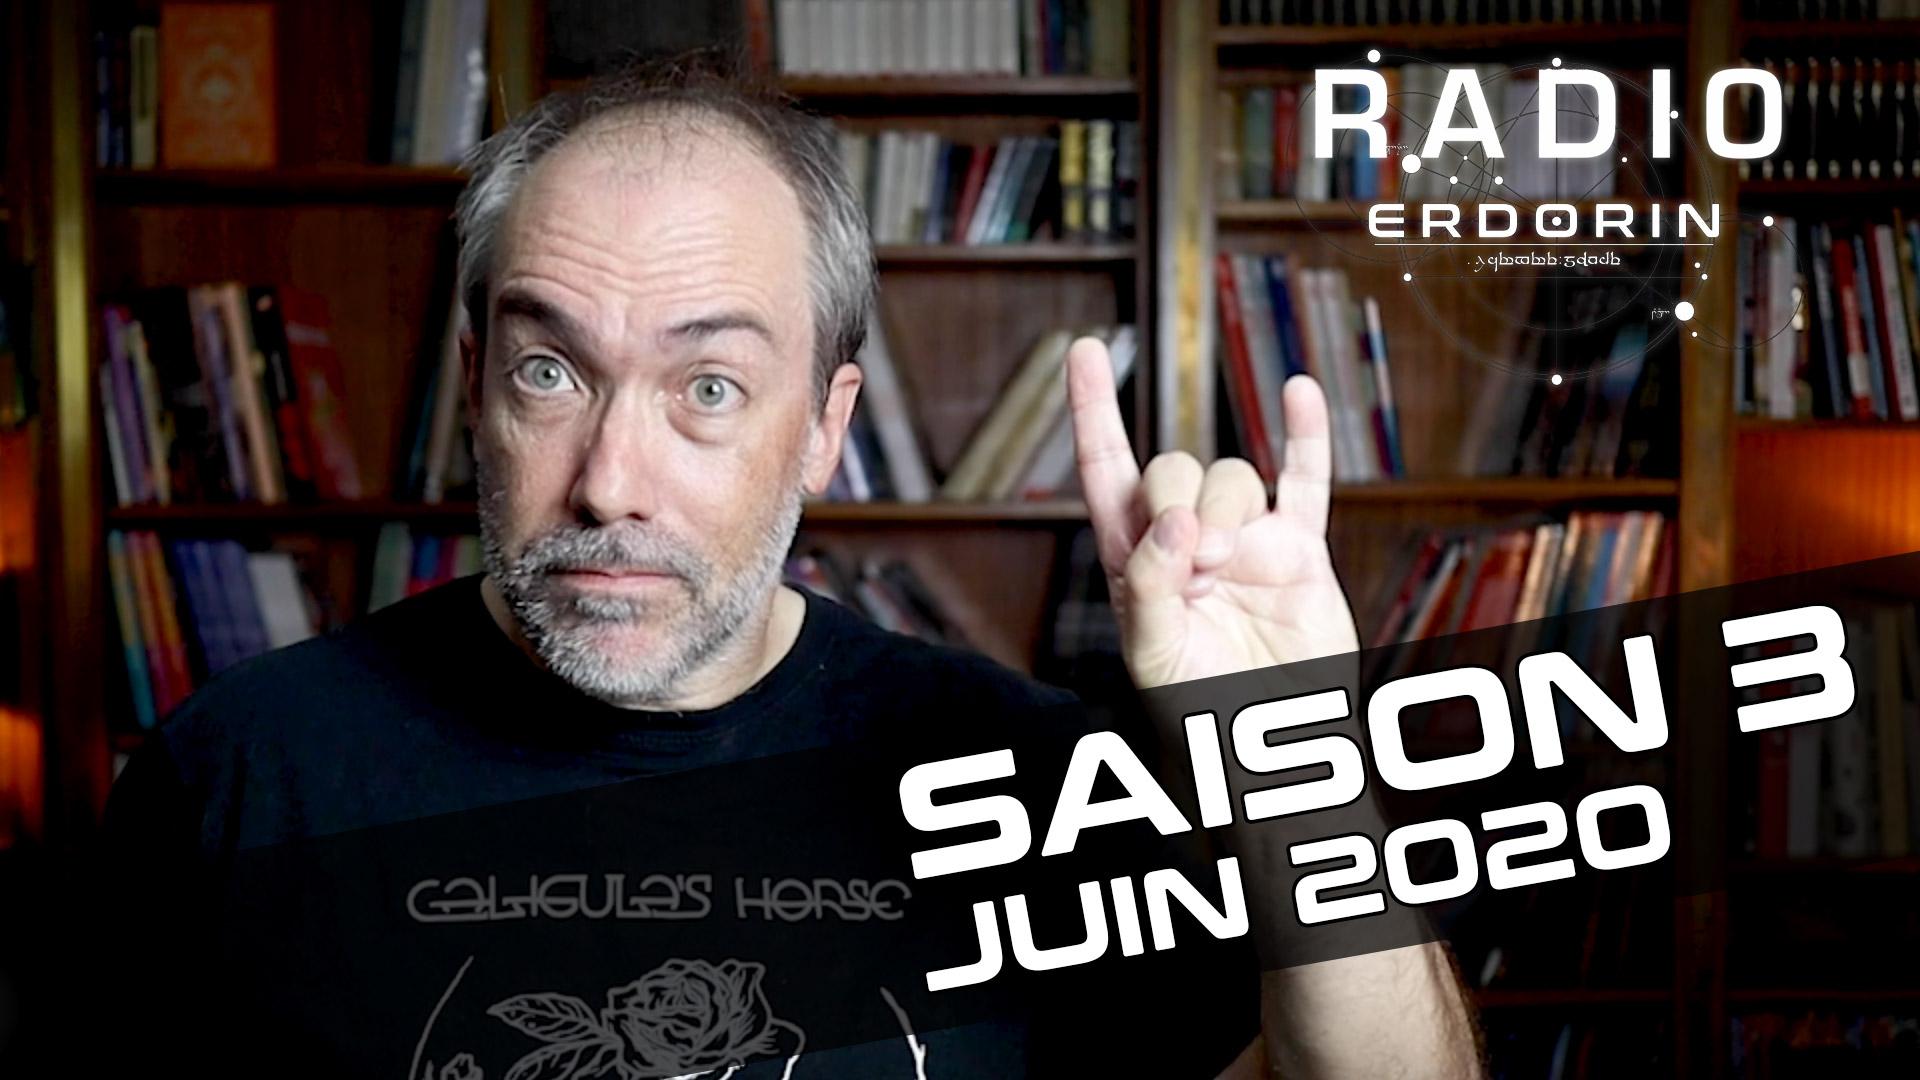 Radio-Erdorin S3E6 - Juin-2020